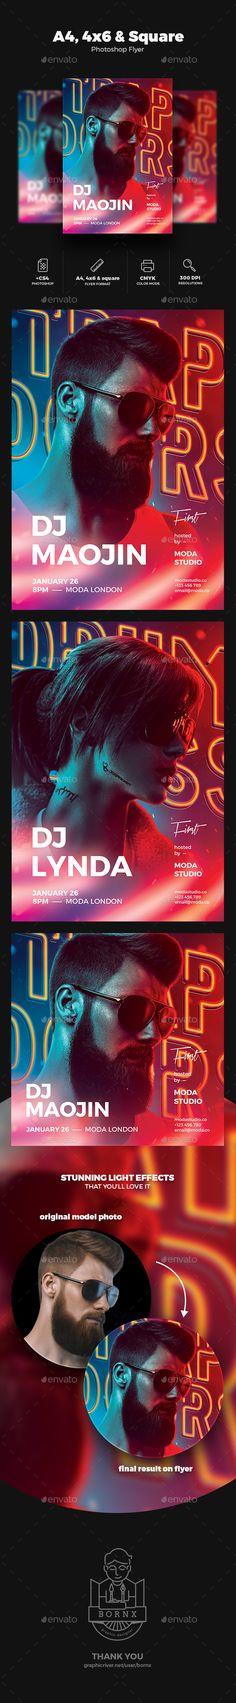 2138 Best Flyer Design Inspirations Images On Pinterest In 2019